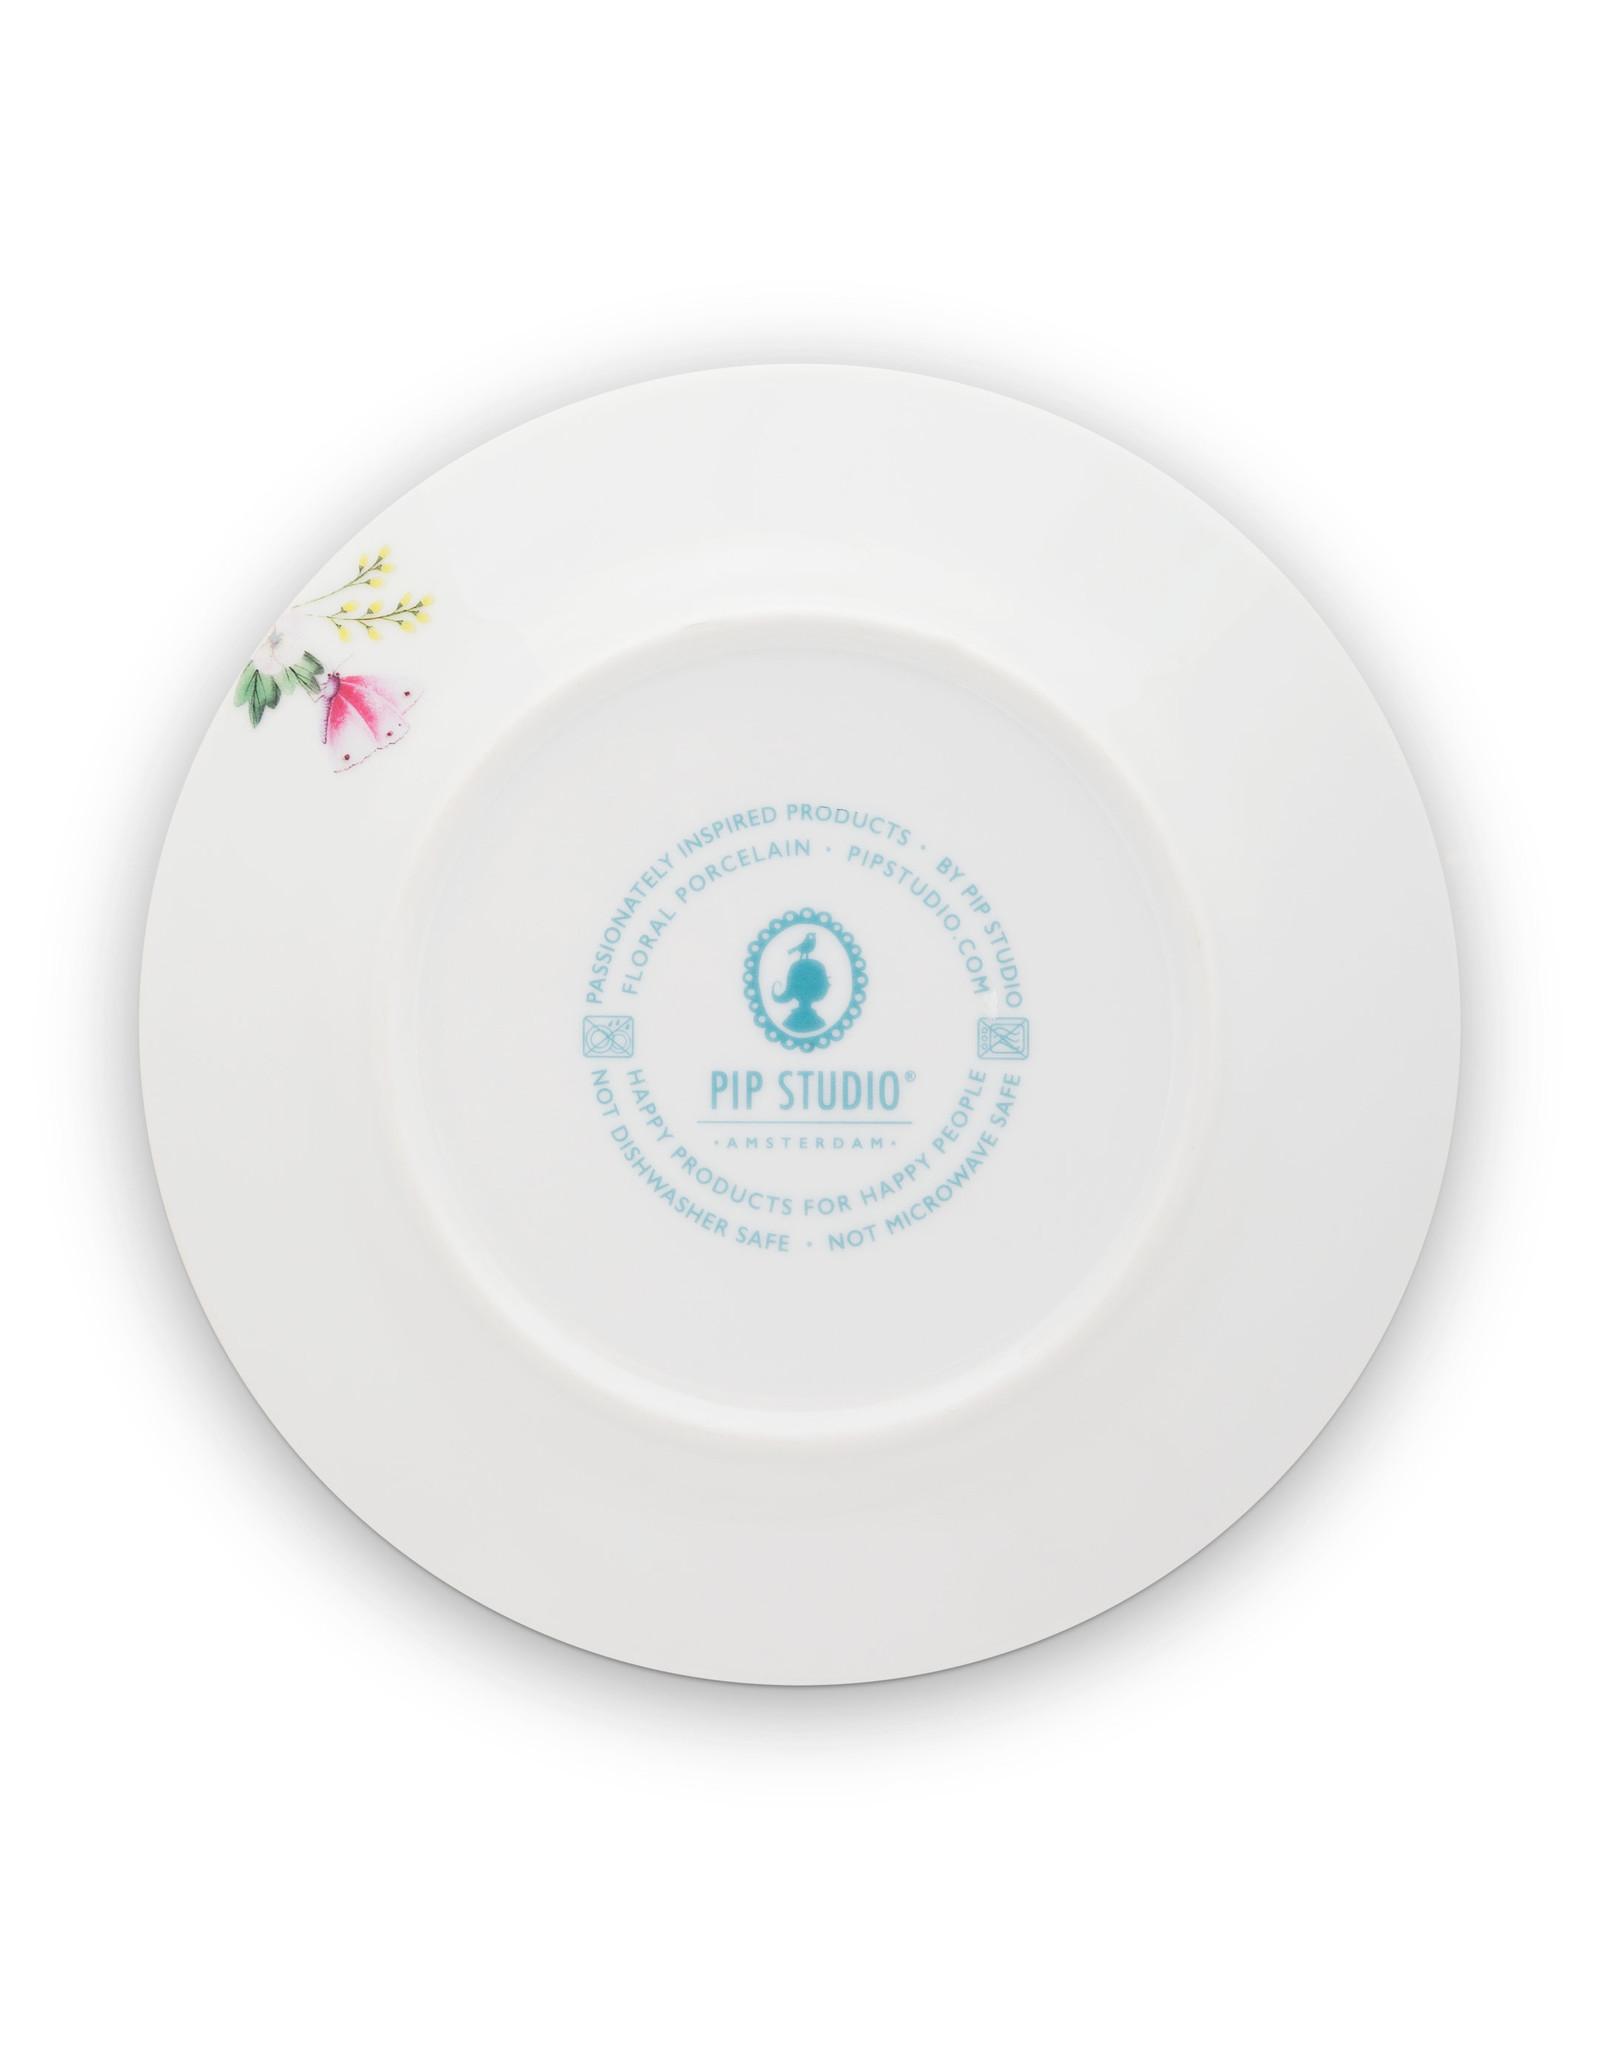 pip studio Plate Blushing Birds White 21cm